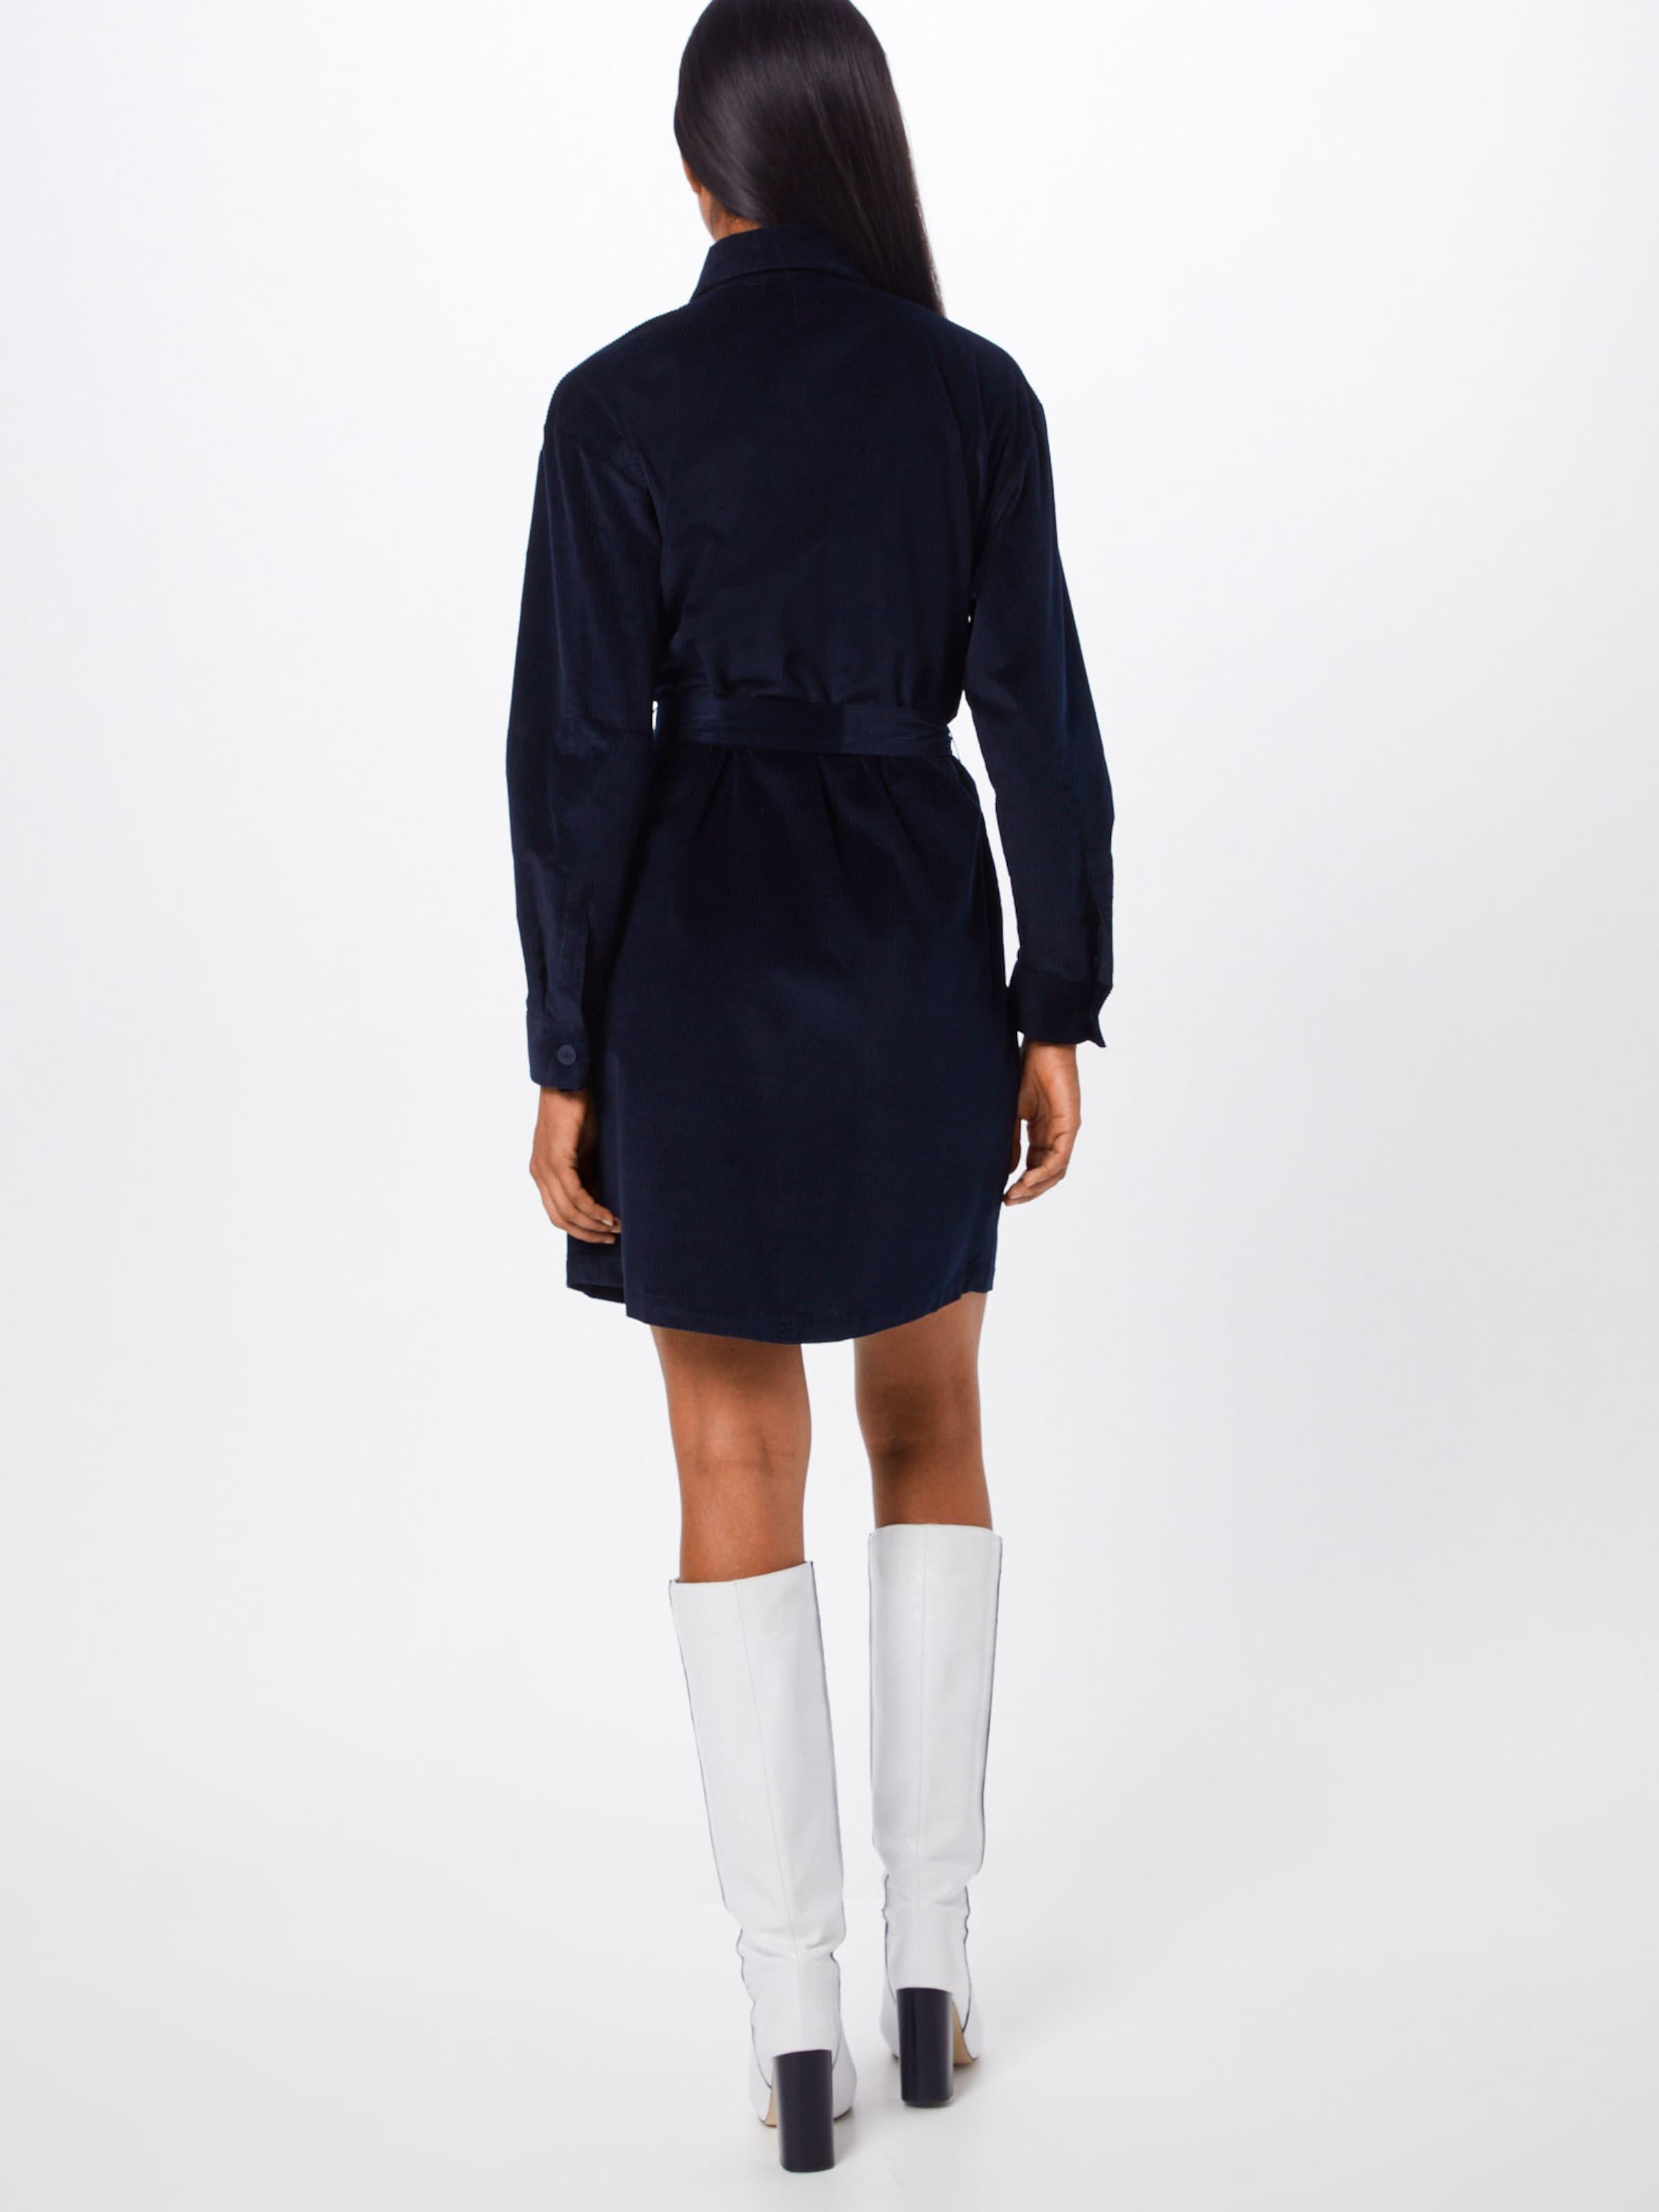 Kleid In 'emiraya' Kleid Nachtblau 'emiraya' Hugo In Nachtblau 'emiraya' Hugo Hugo Kleid In qUMSzVpGL